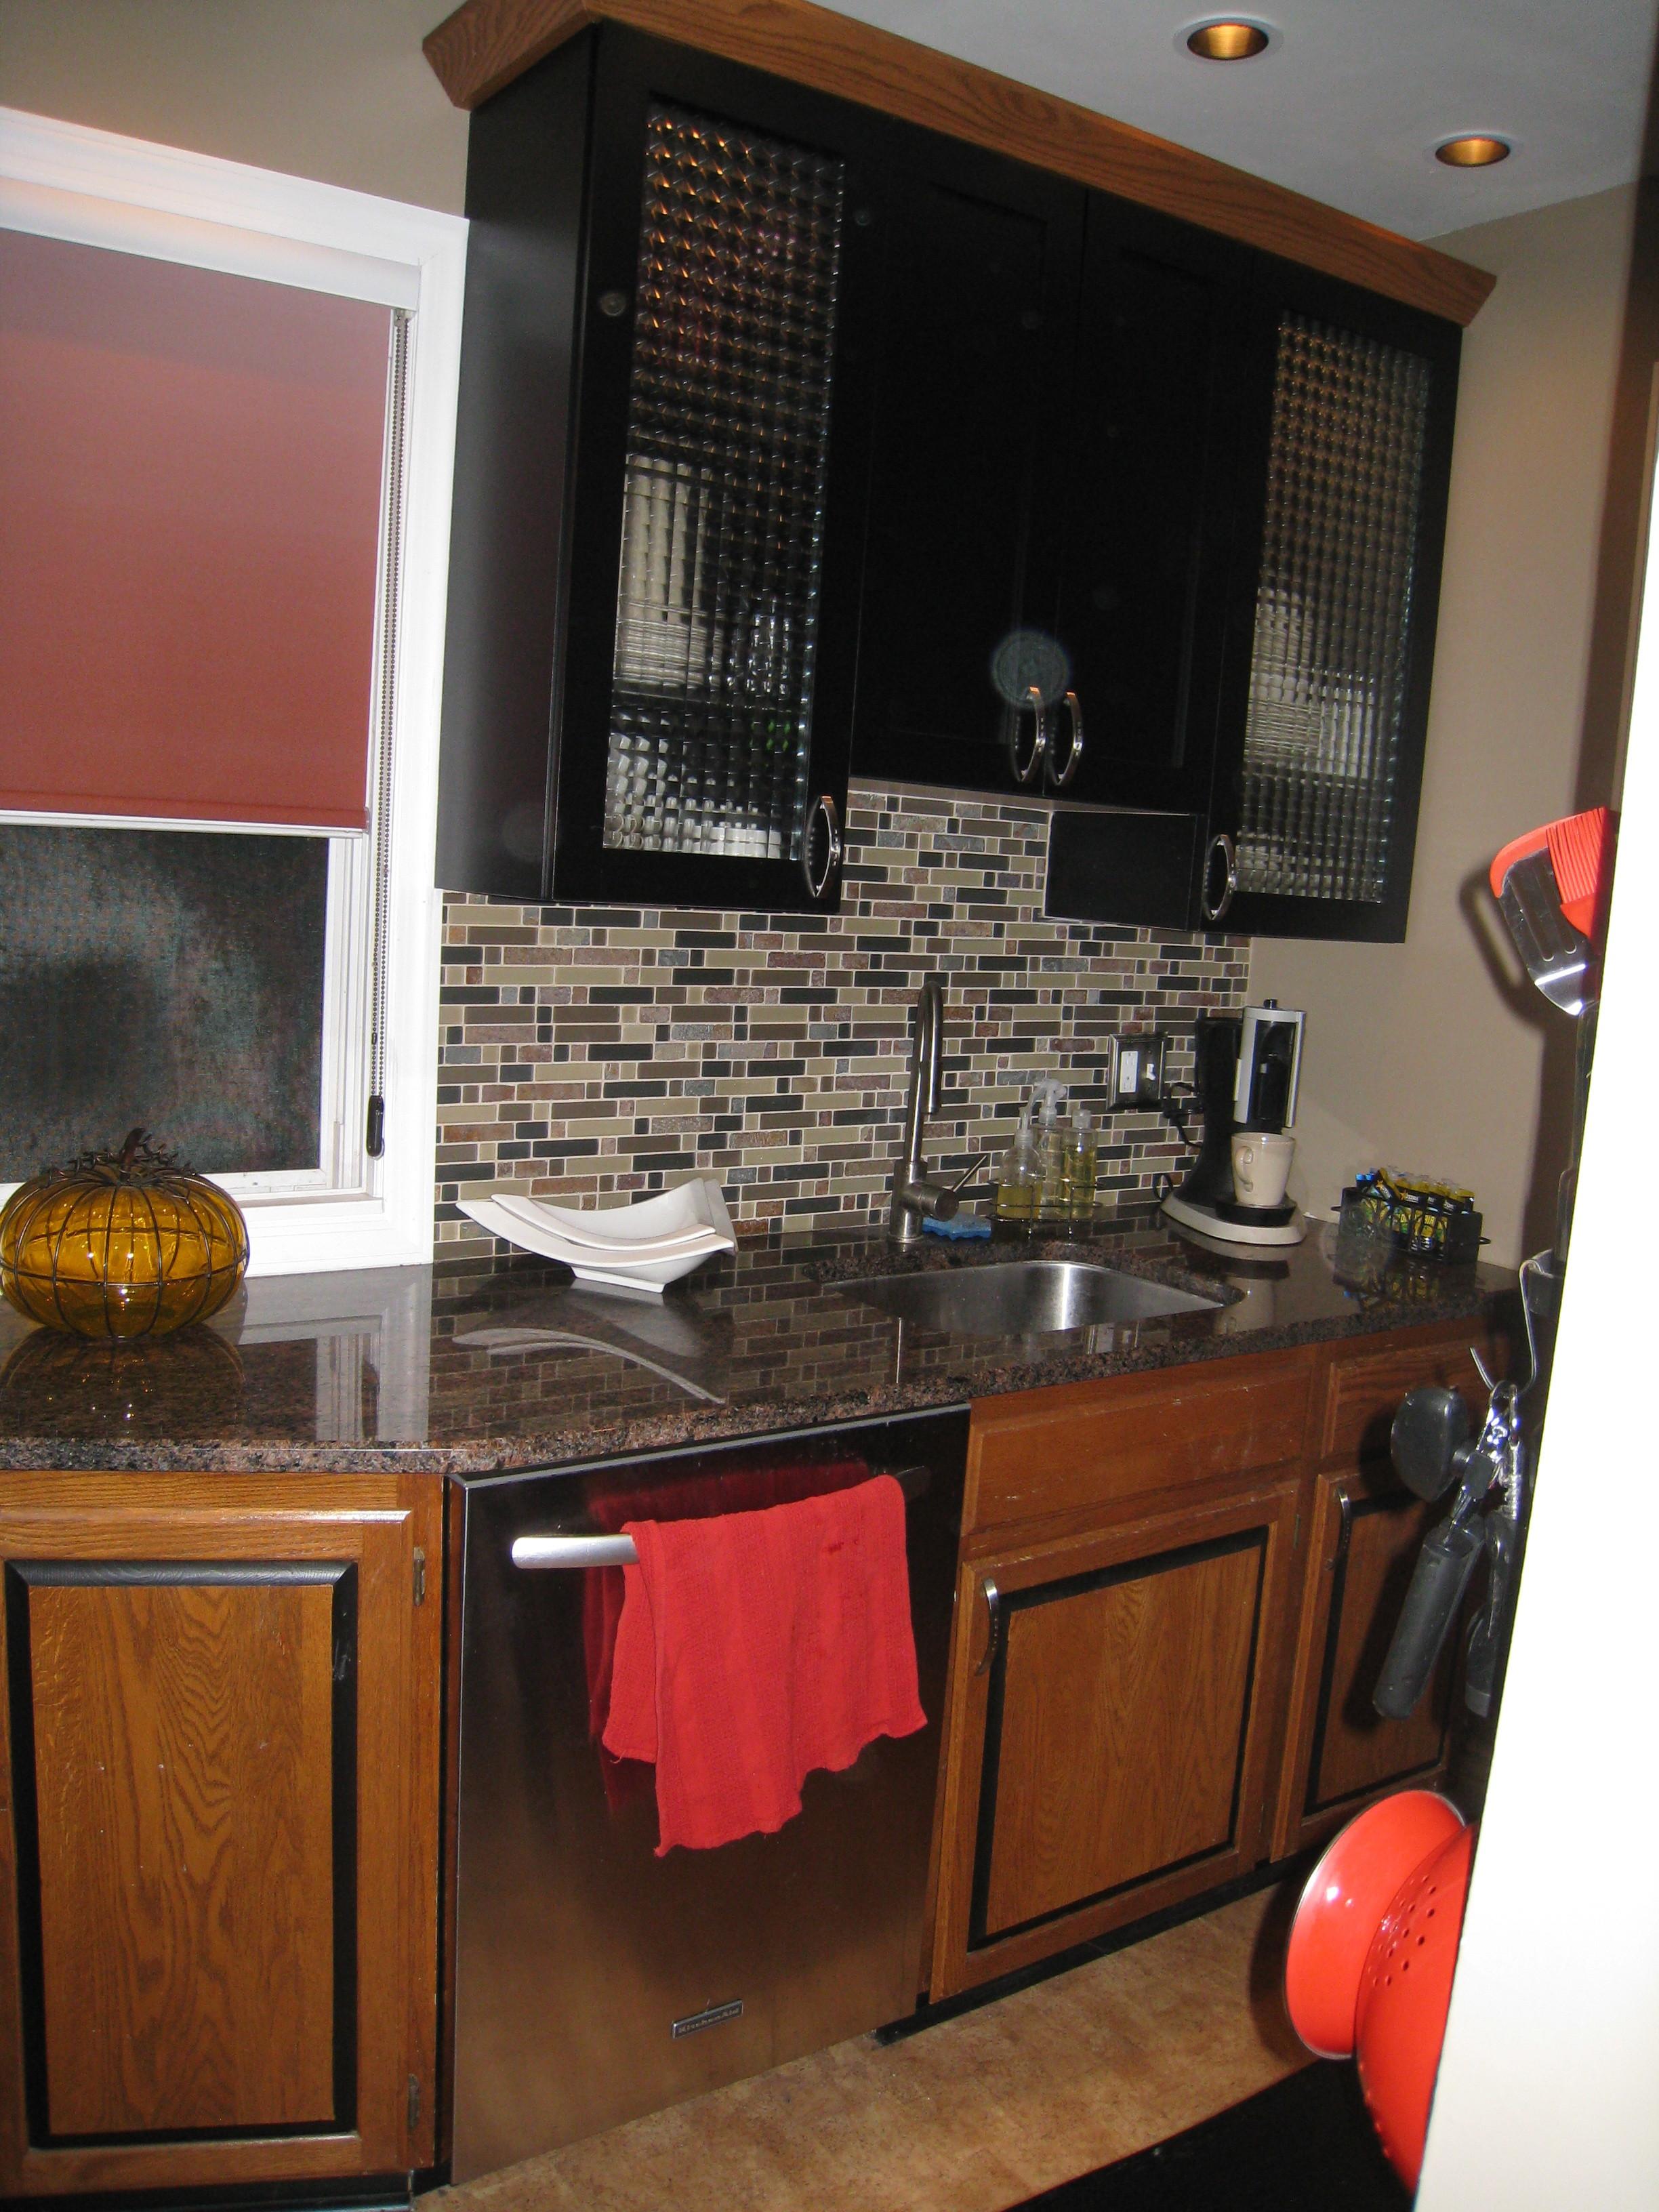 Lin kitchen afterIMG_2808.jpg